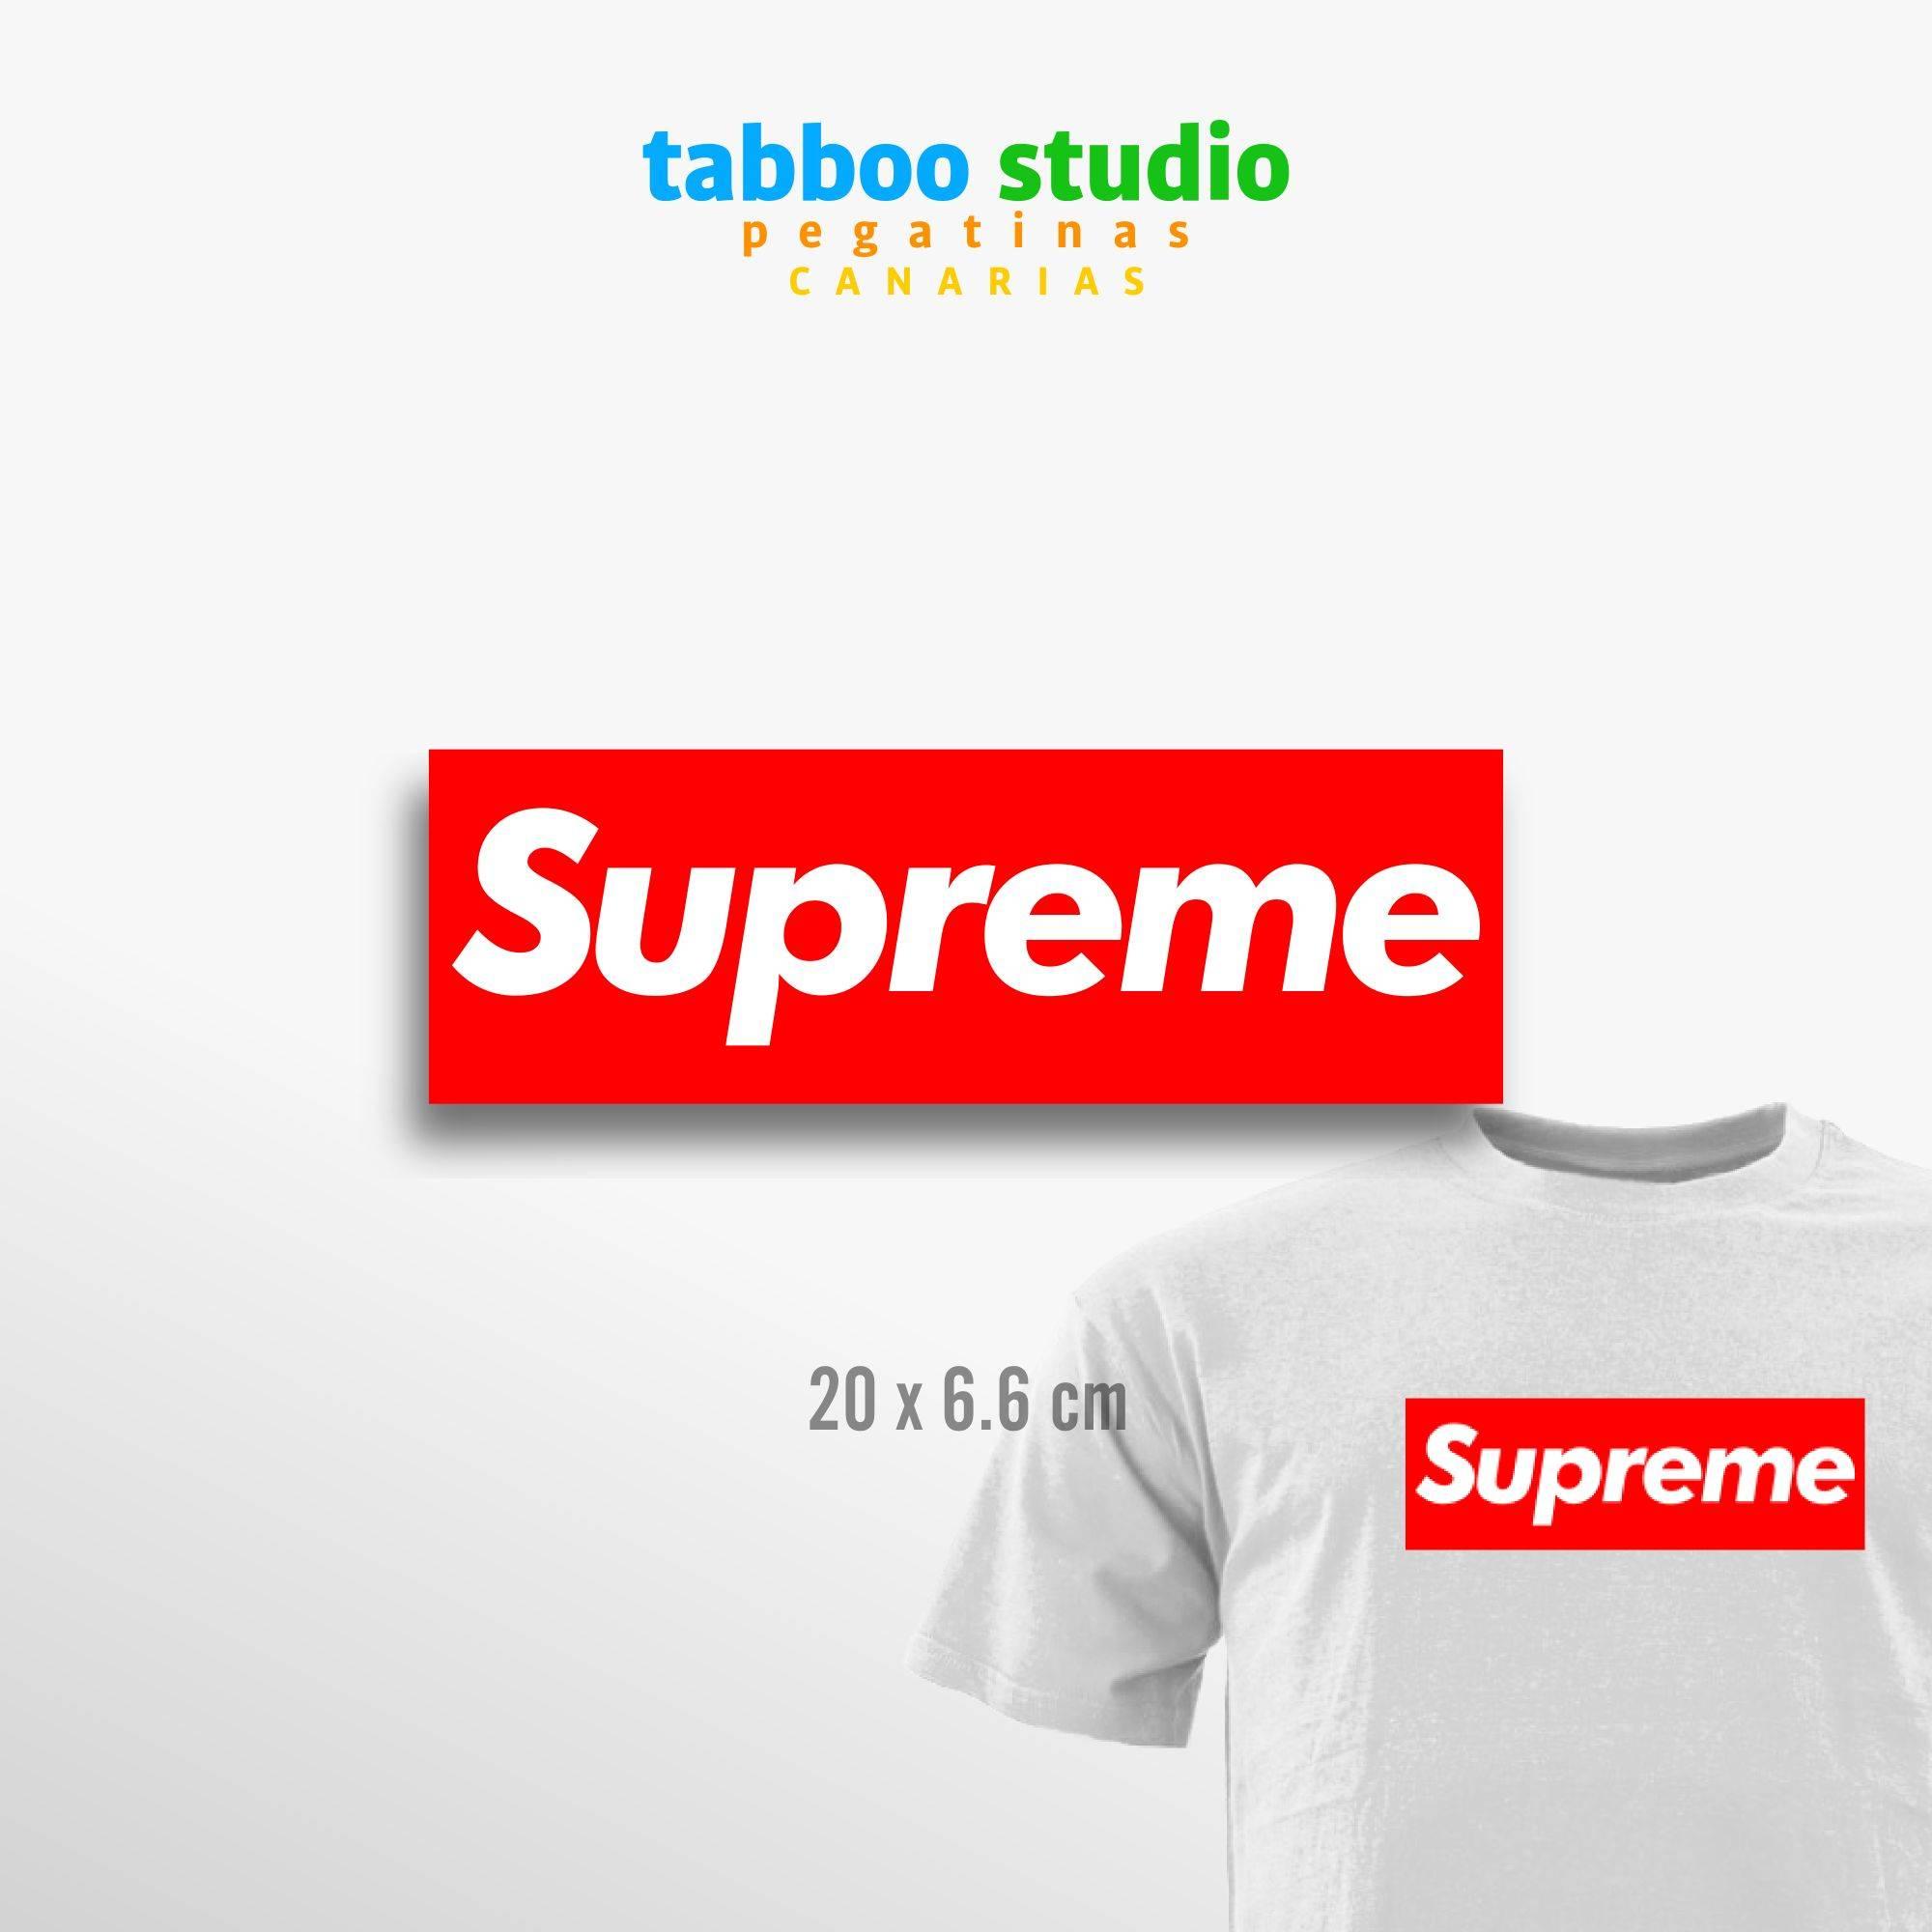 Supreme Iron-on Transfer Sticker - Tabboo Studio